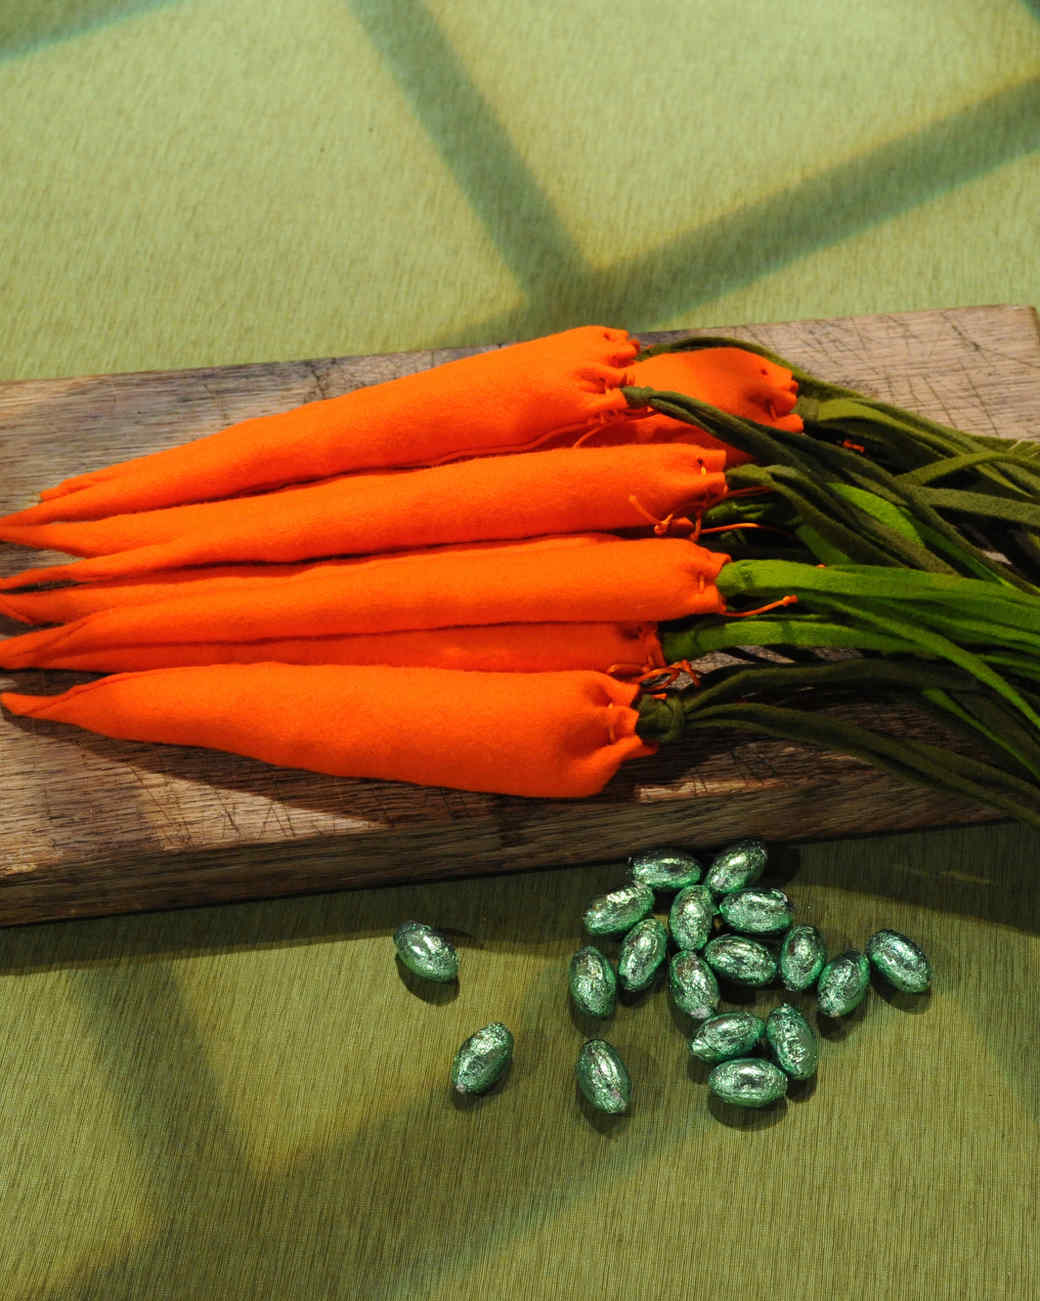 carrot-pouch-mslb7120.jpg